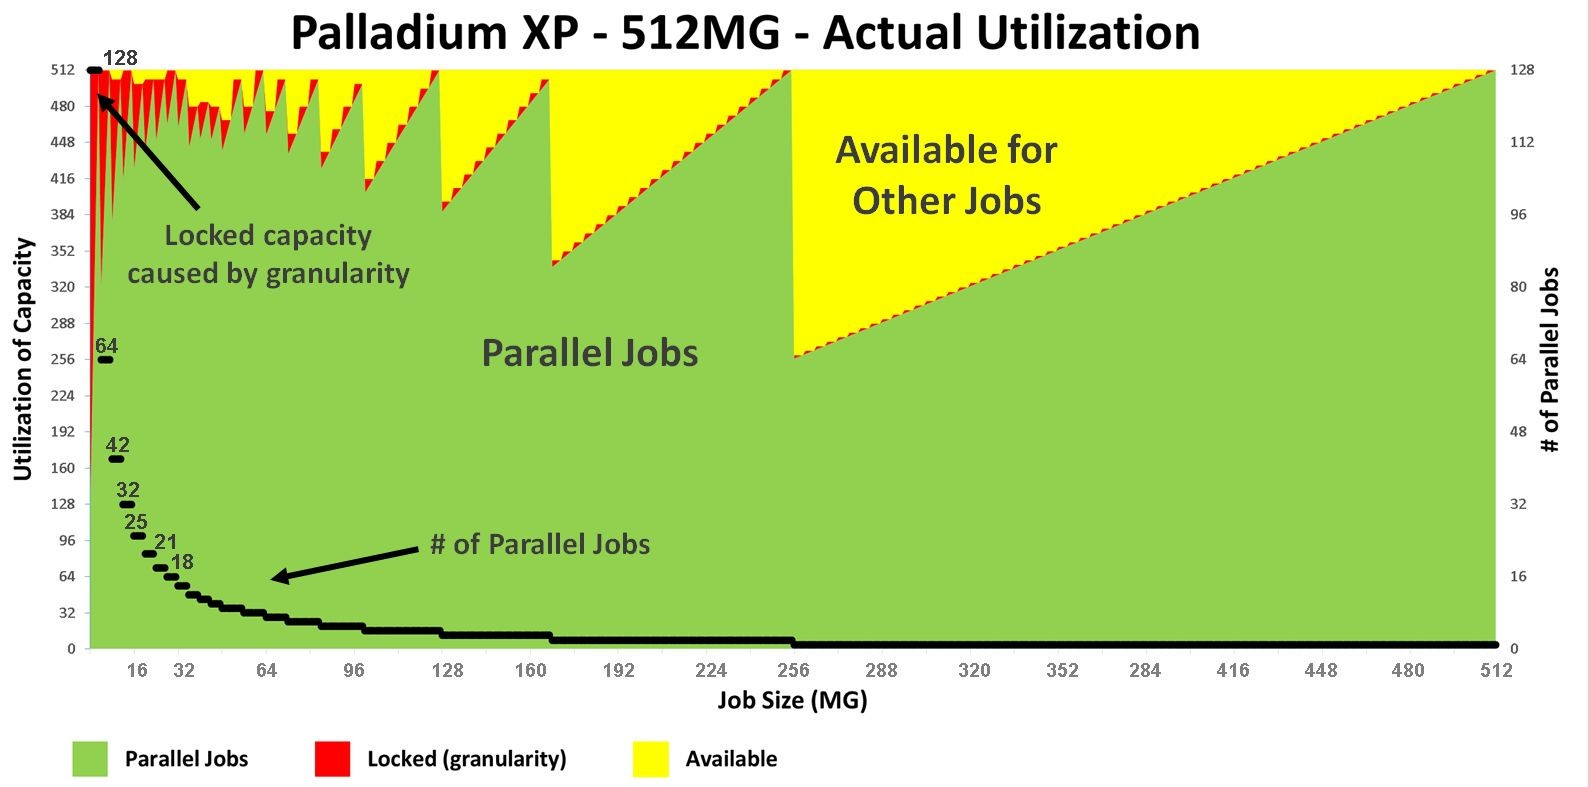 Palladium-XP-Utilization-512MG